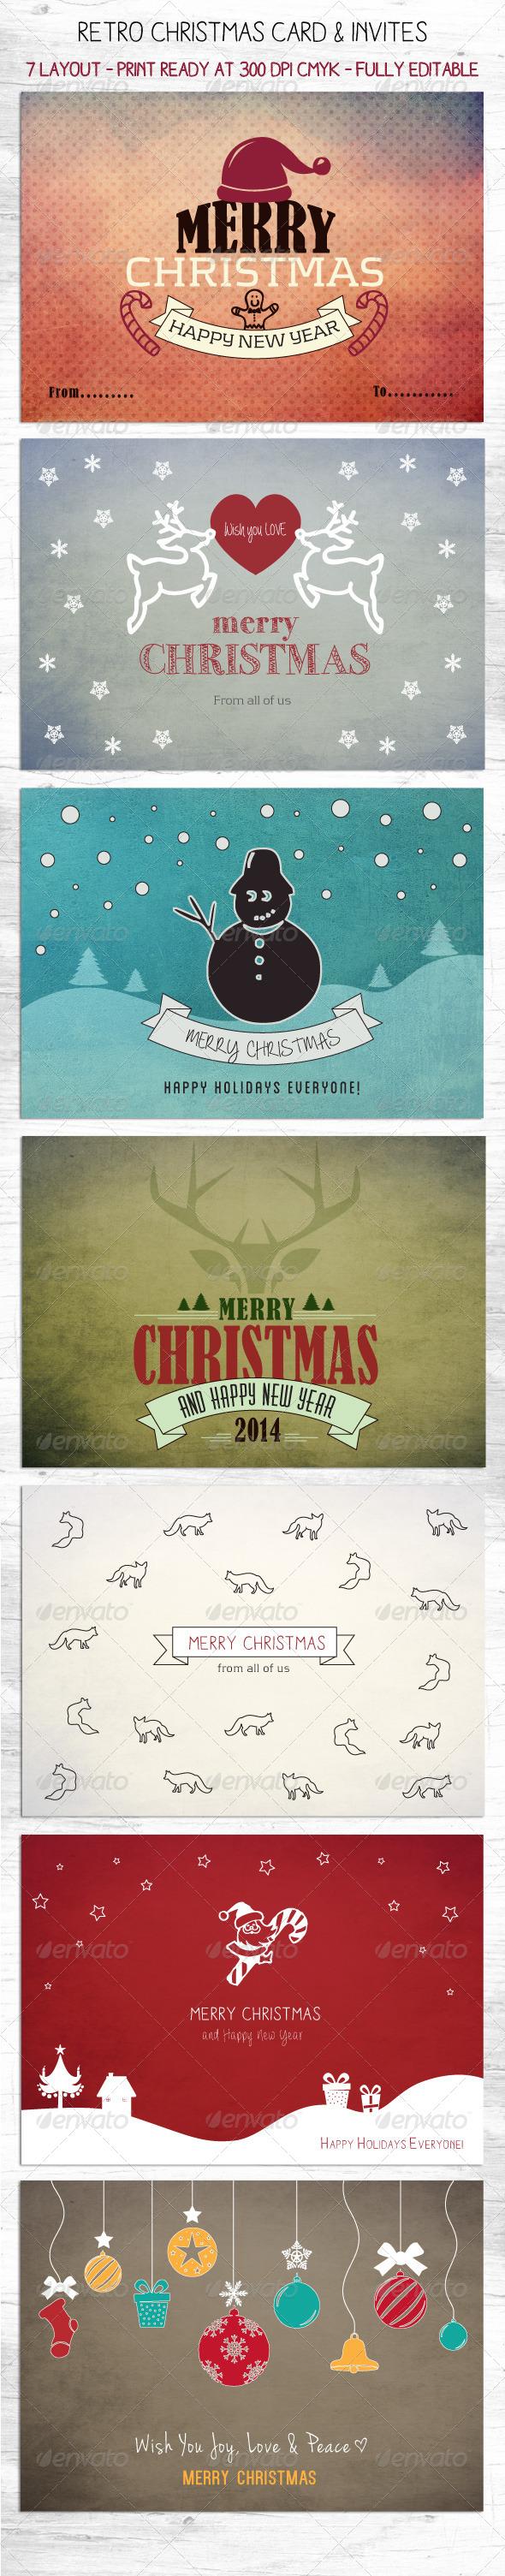 GraphicRiver Retro Christmas Card & Invites 6295455